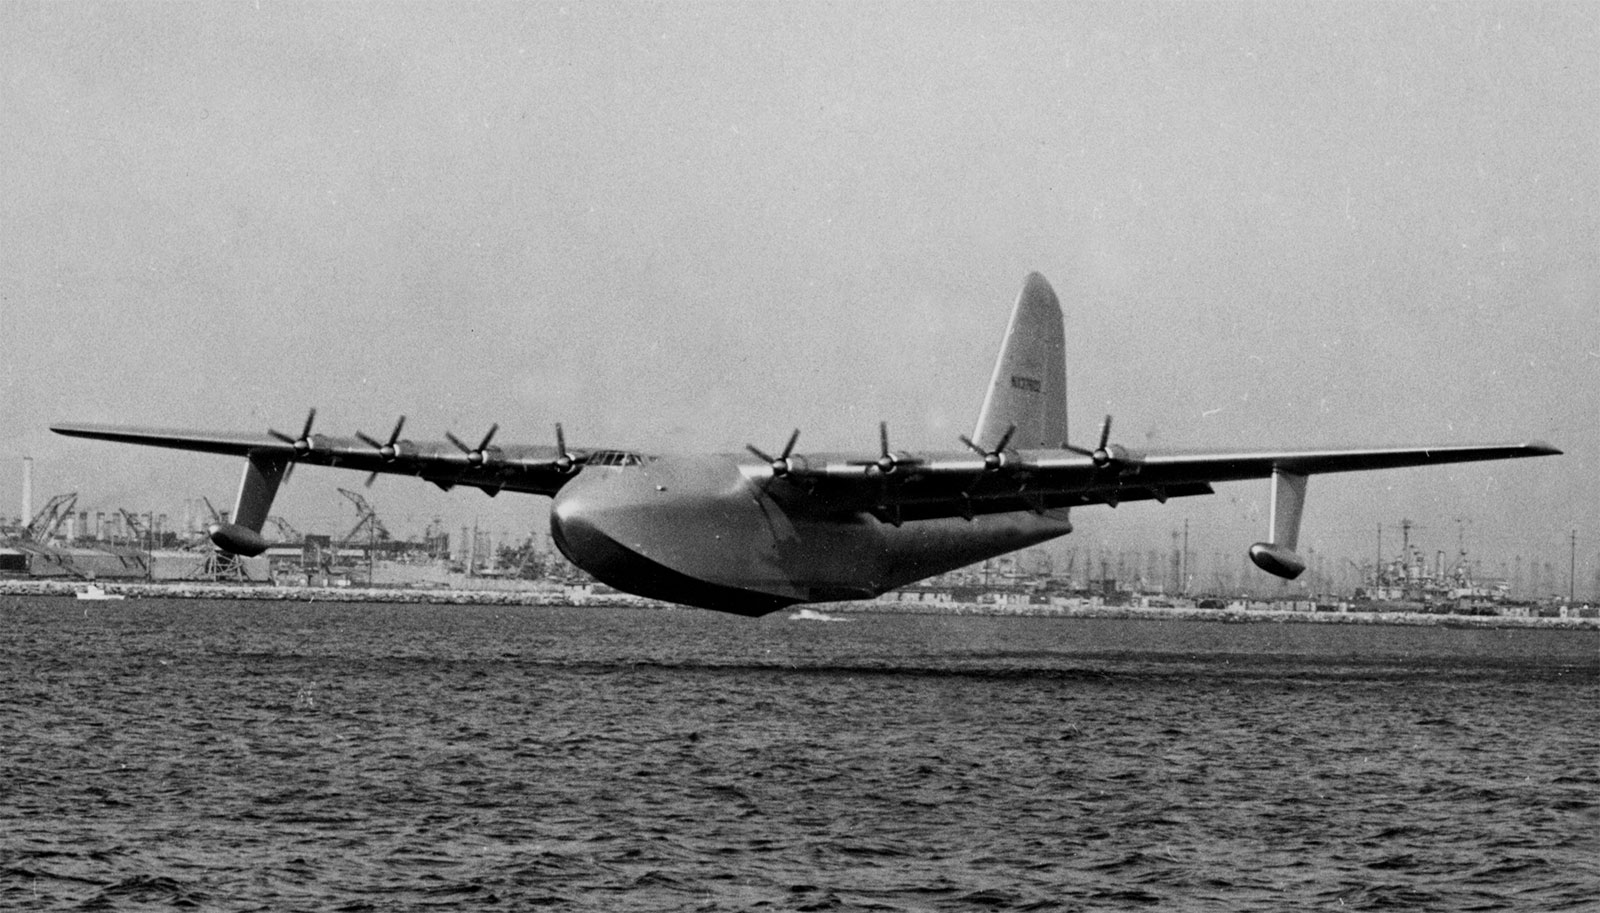 Hughes-H-4-Hercules-Spruce-Goose-In-Flight.jpg